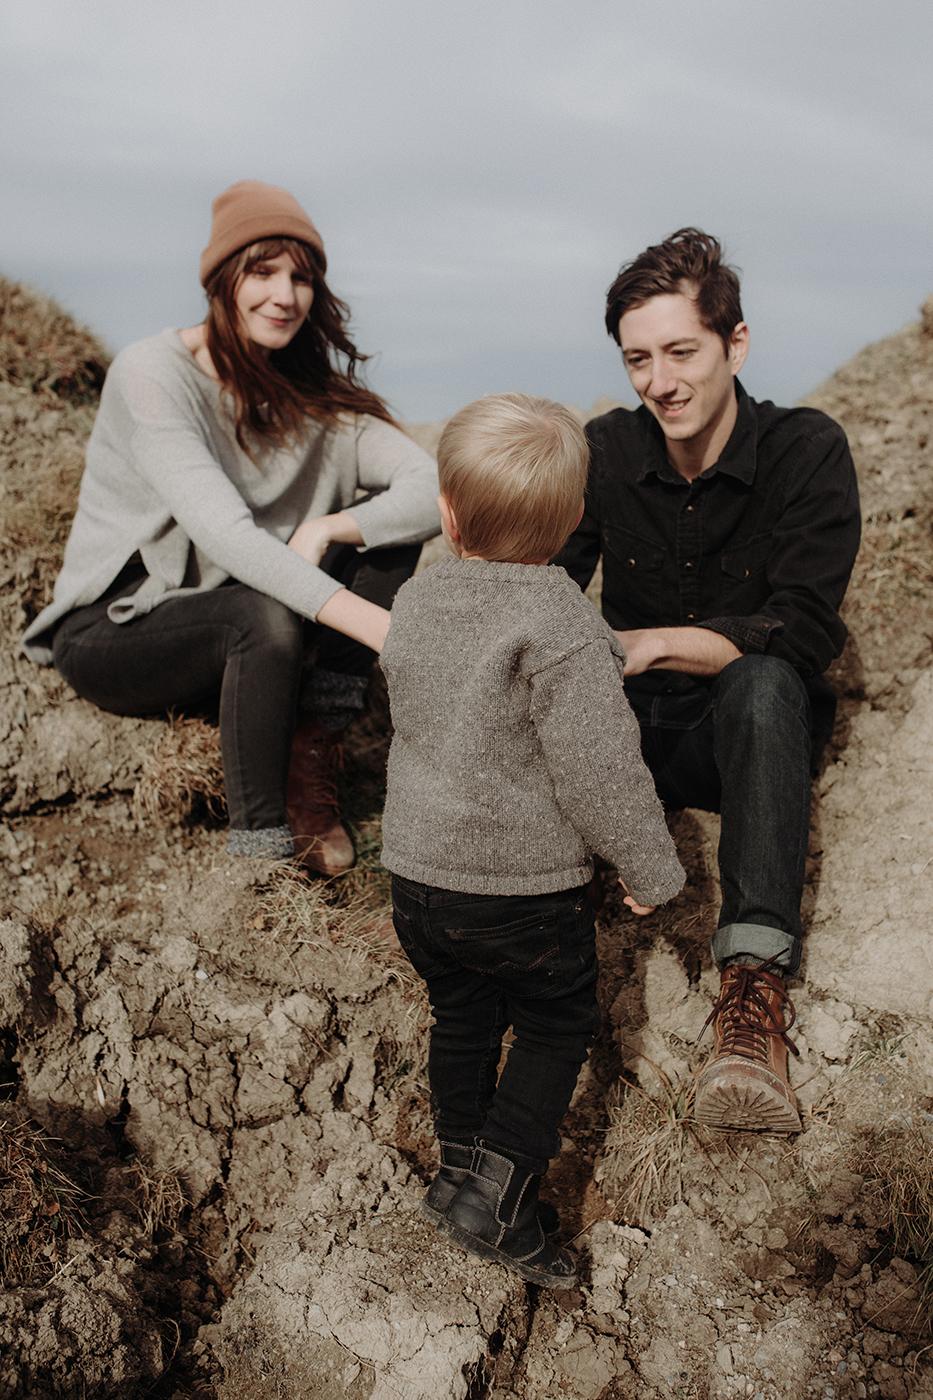 dudash-family-15-web.jpg